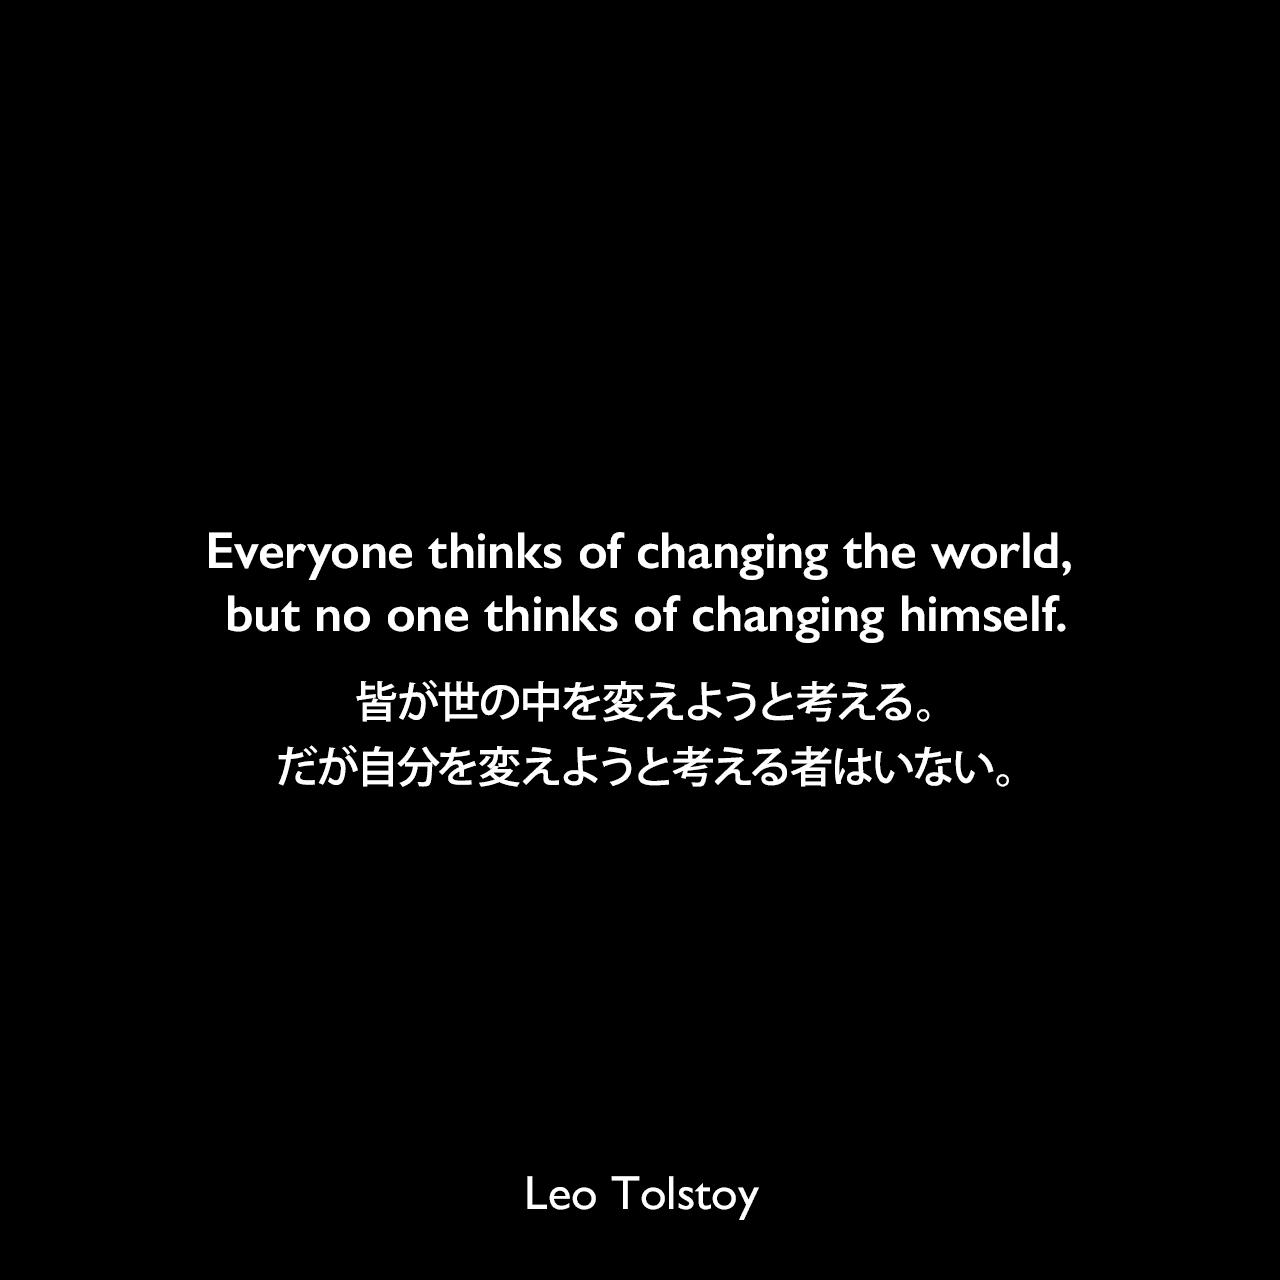 Everyone thinks of changing the world, but no one thinks of changing himself.皆が世の中を変えようと考える。だが自分を変えようと考える者はいない。Leo Tolstoy